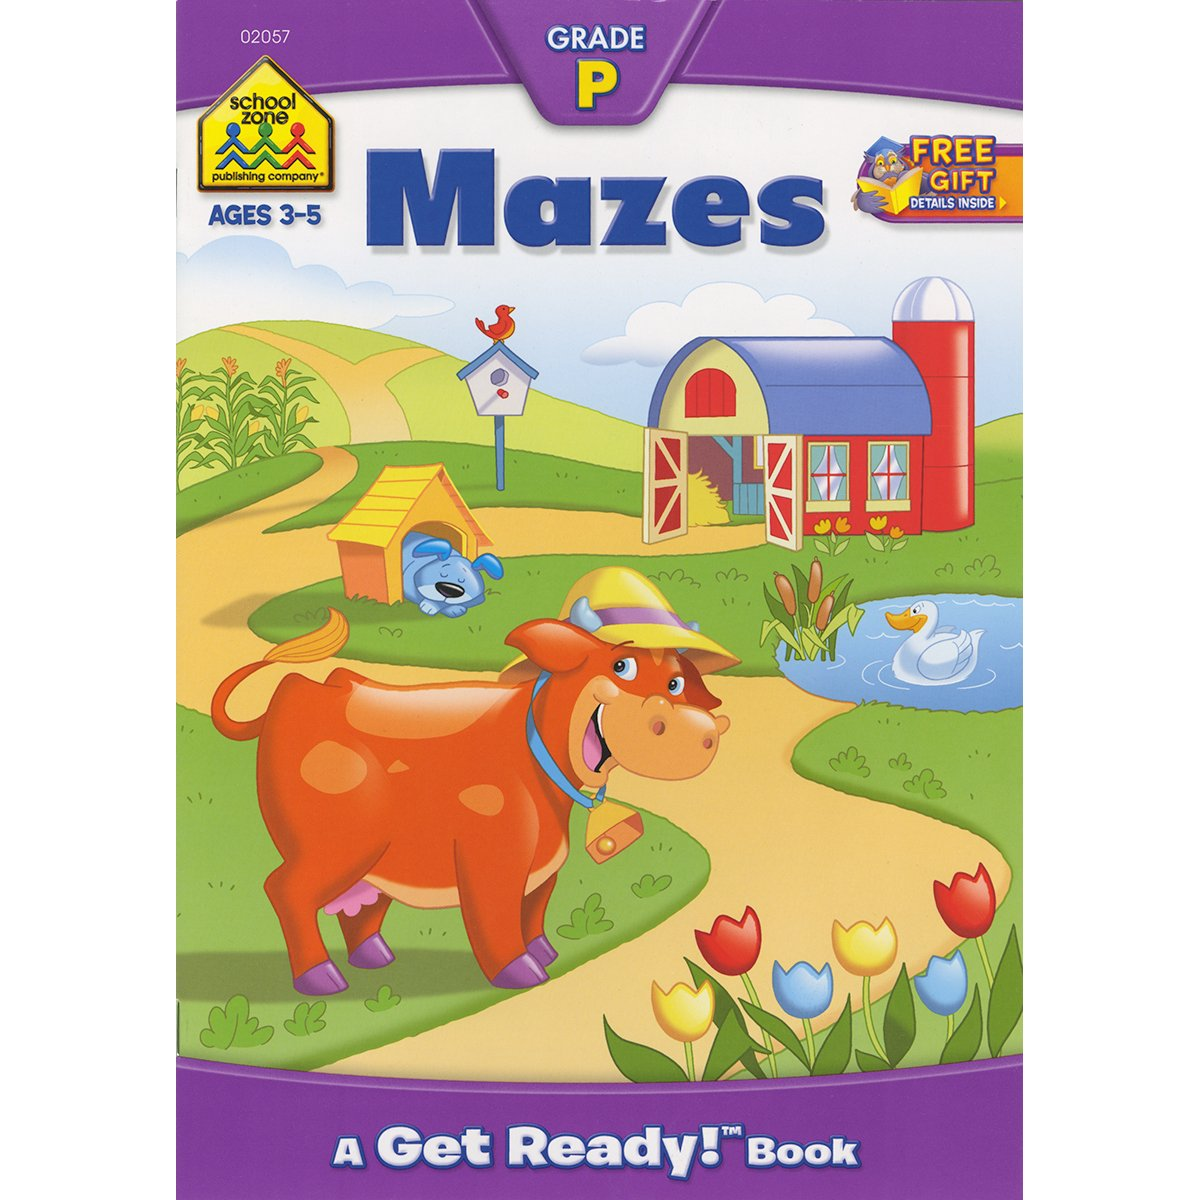 Preschool Workbooks 32 Pages-Mazes Notions In Network